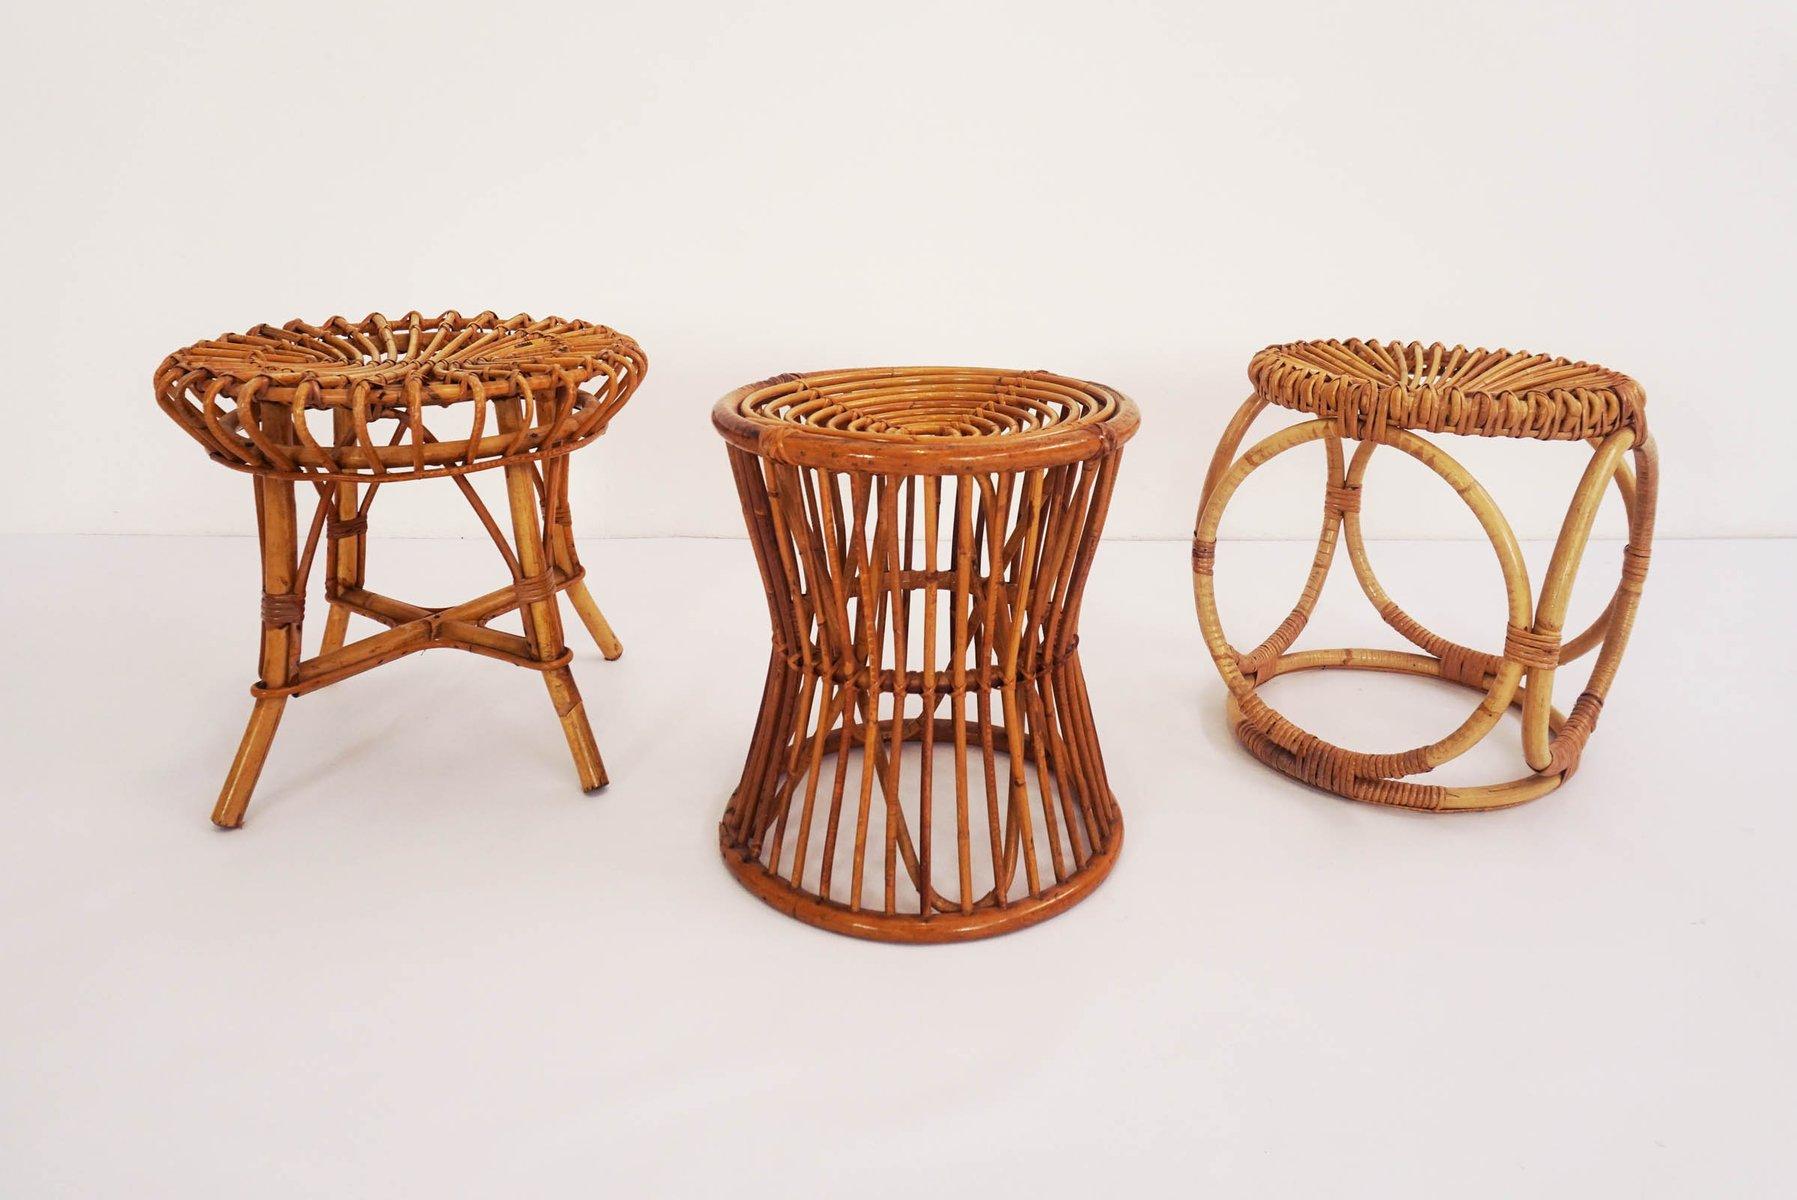 vintage hocker aus rattan von pierantonio bonacina 3er set bei pamono kaufen. Black Bedroom Furniture Sets. Home Design Ideas